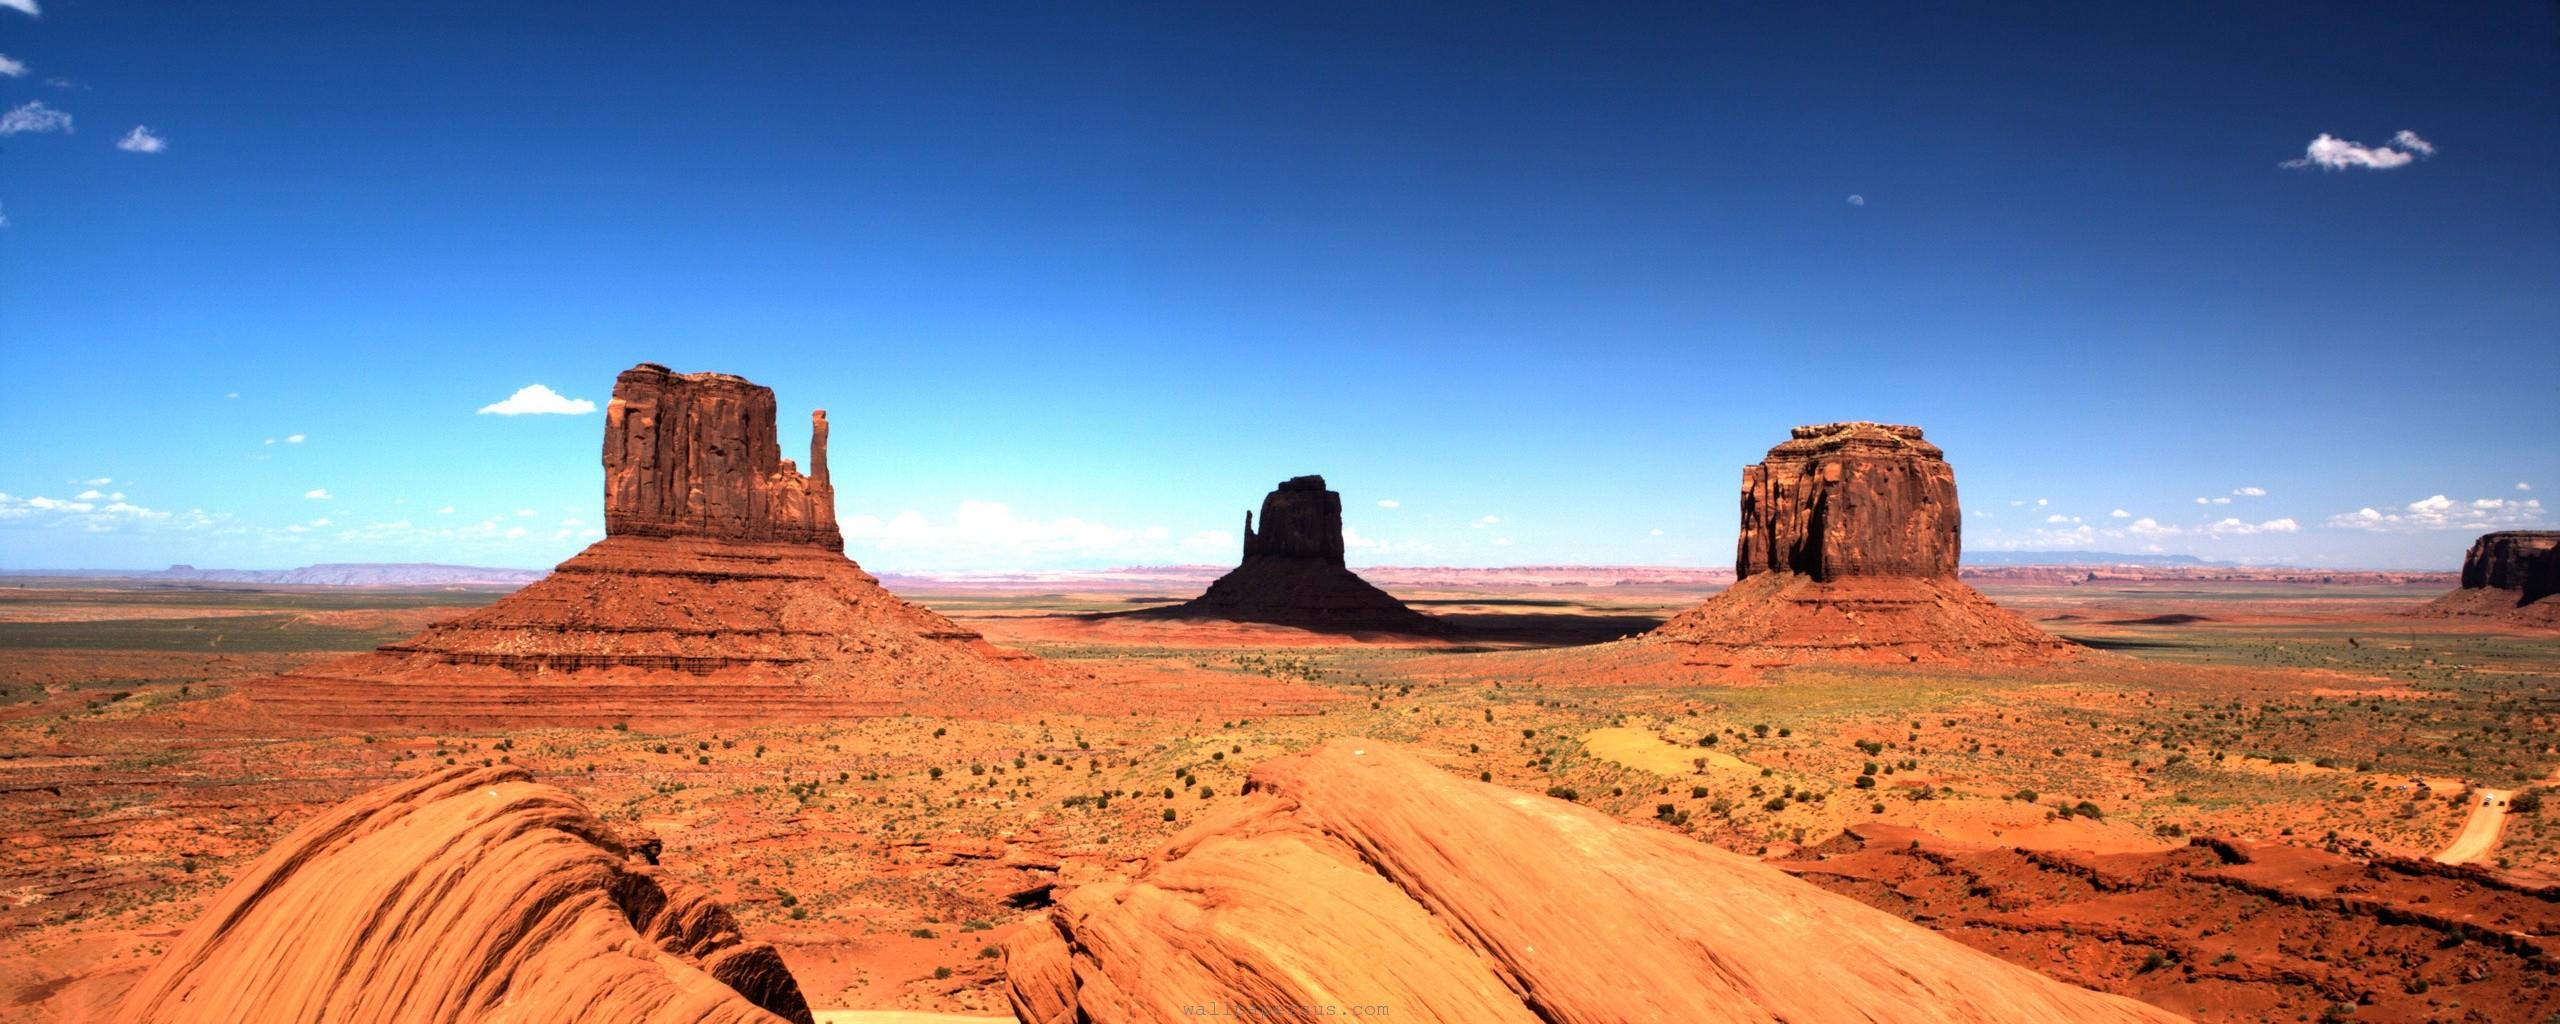 Arizona, USA, Monument Valley, deserto